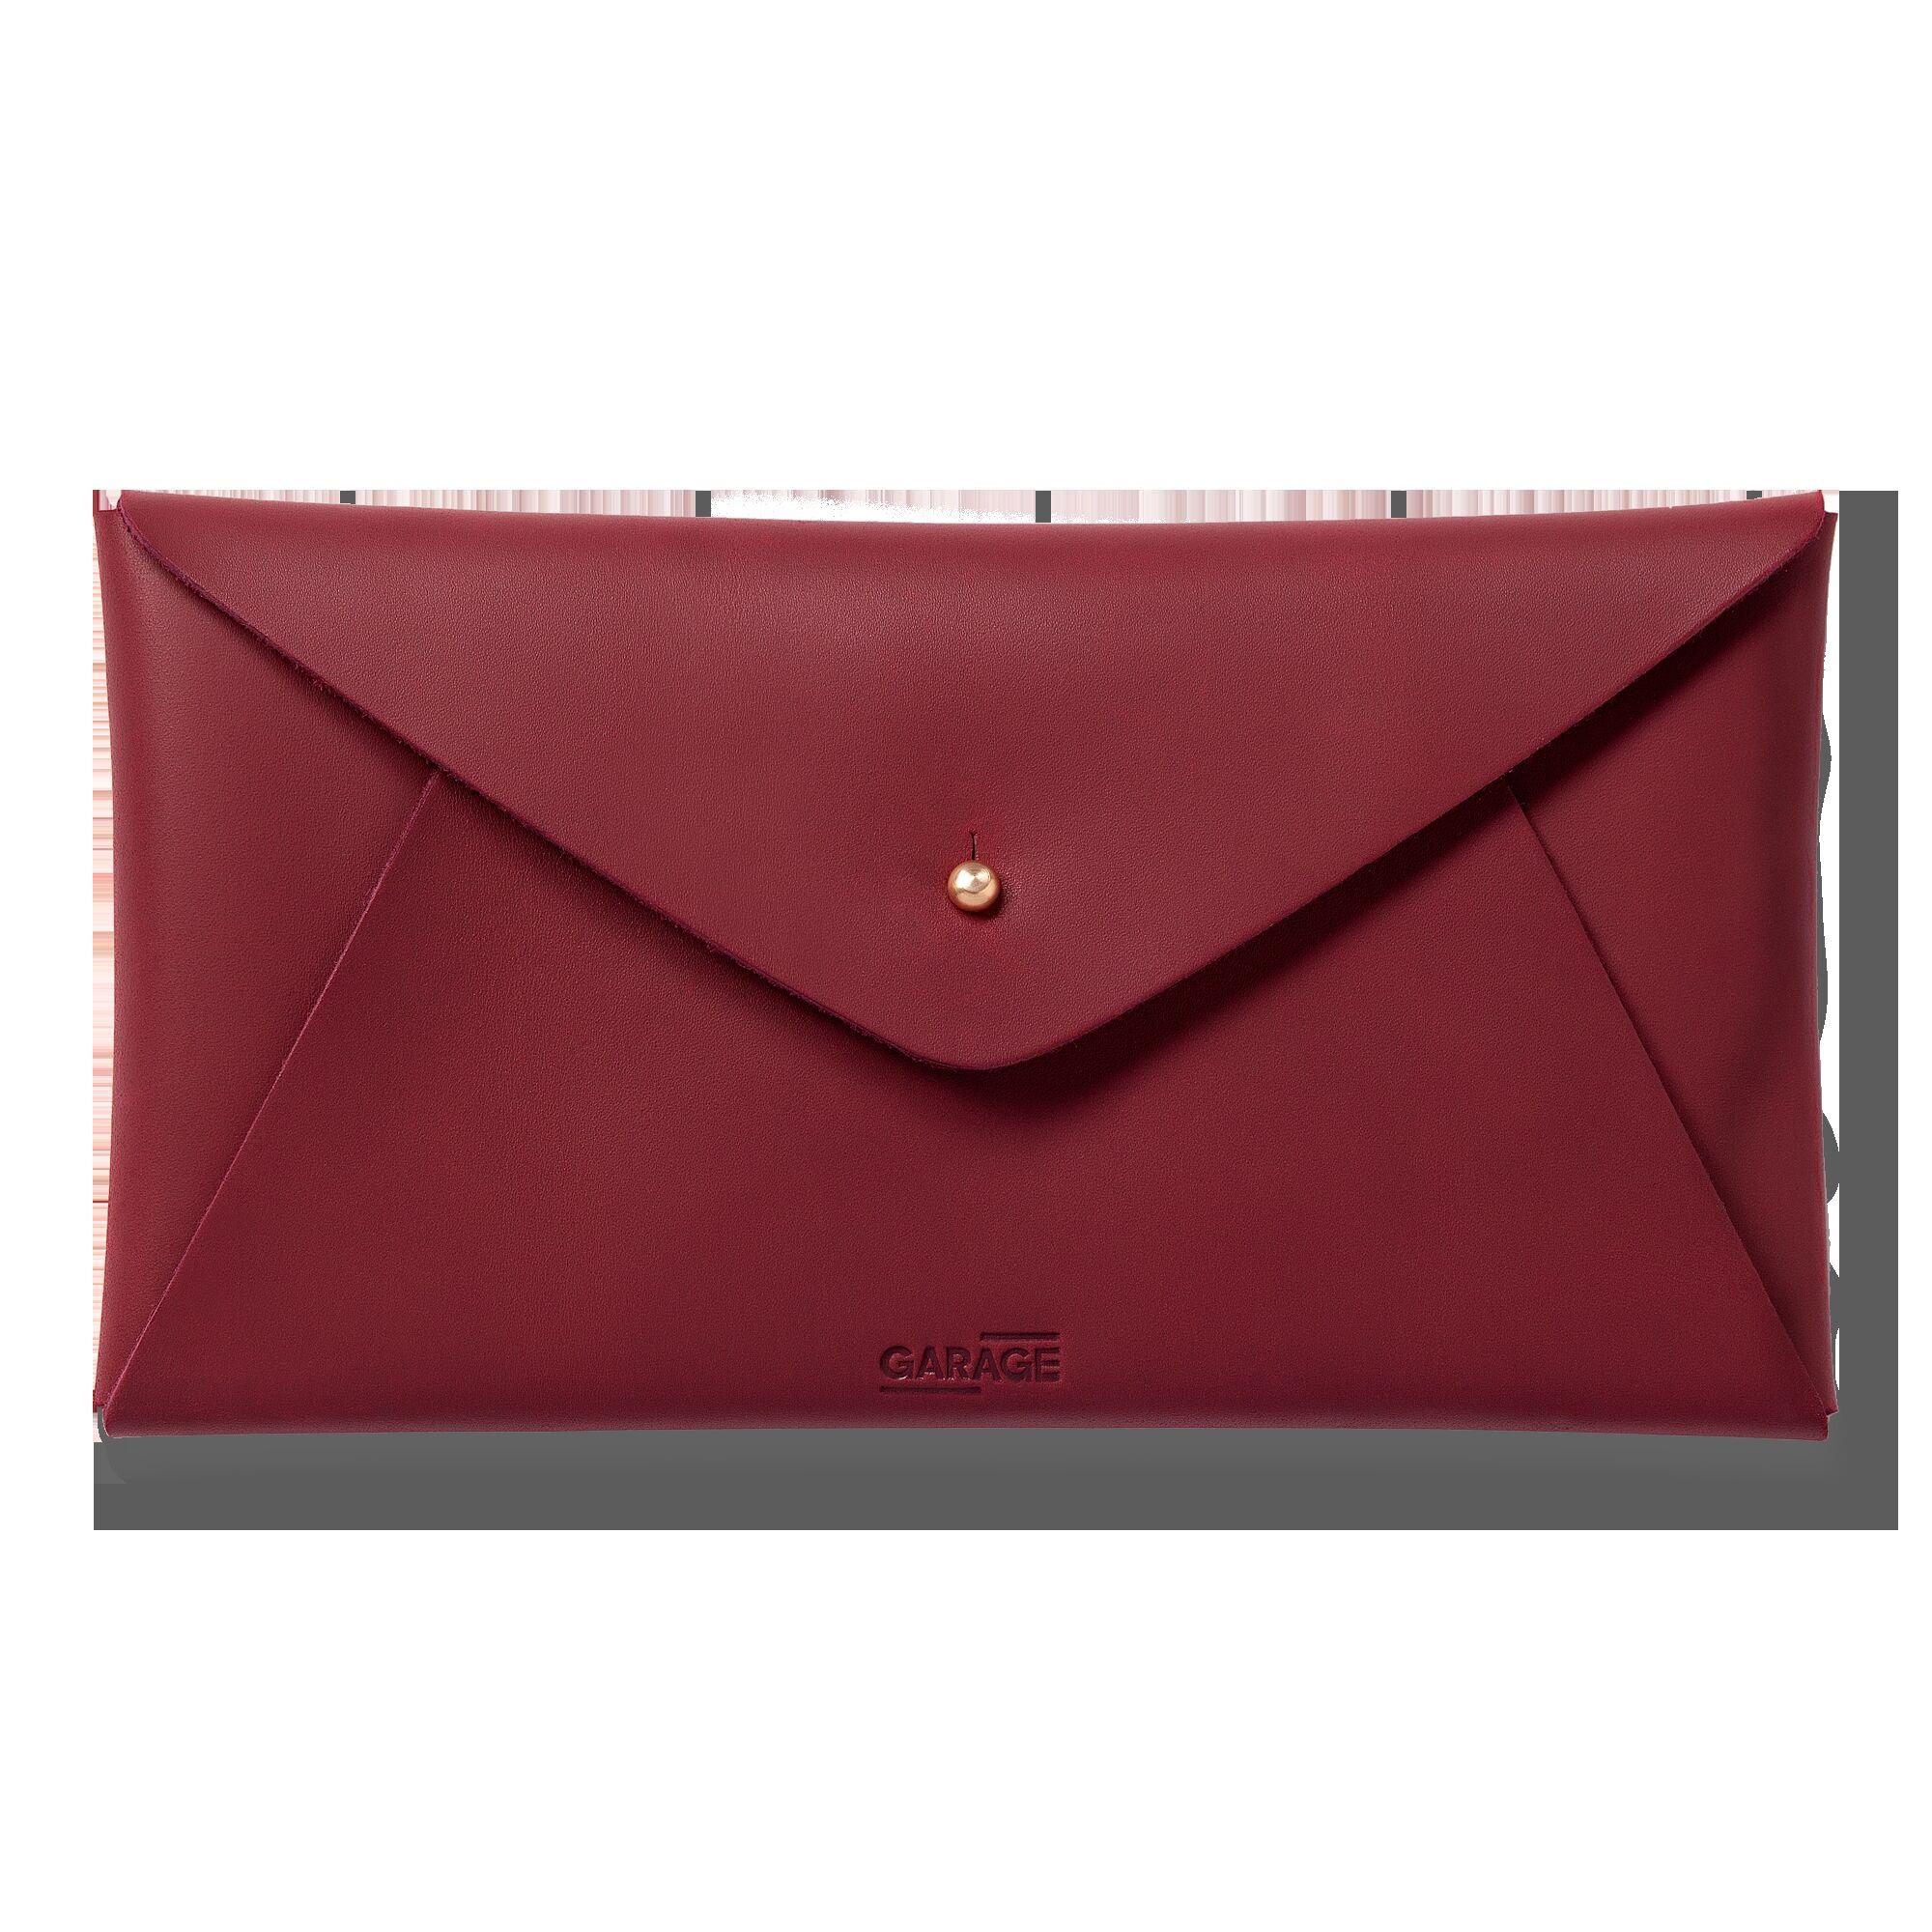 All-purpose purse, burgundy